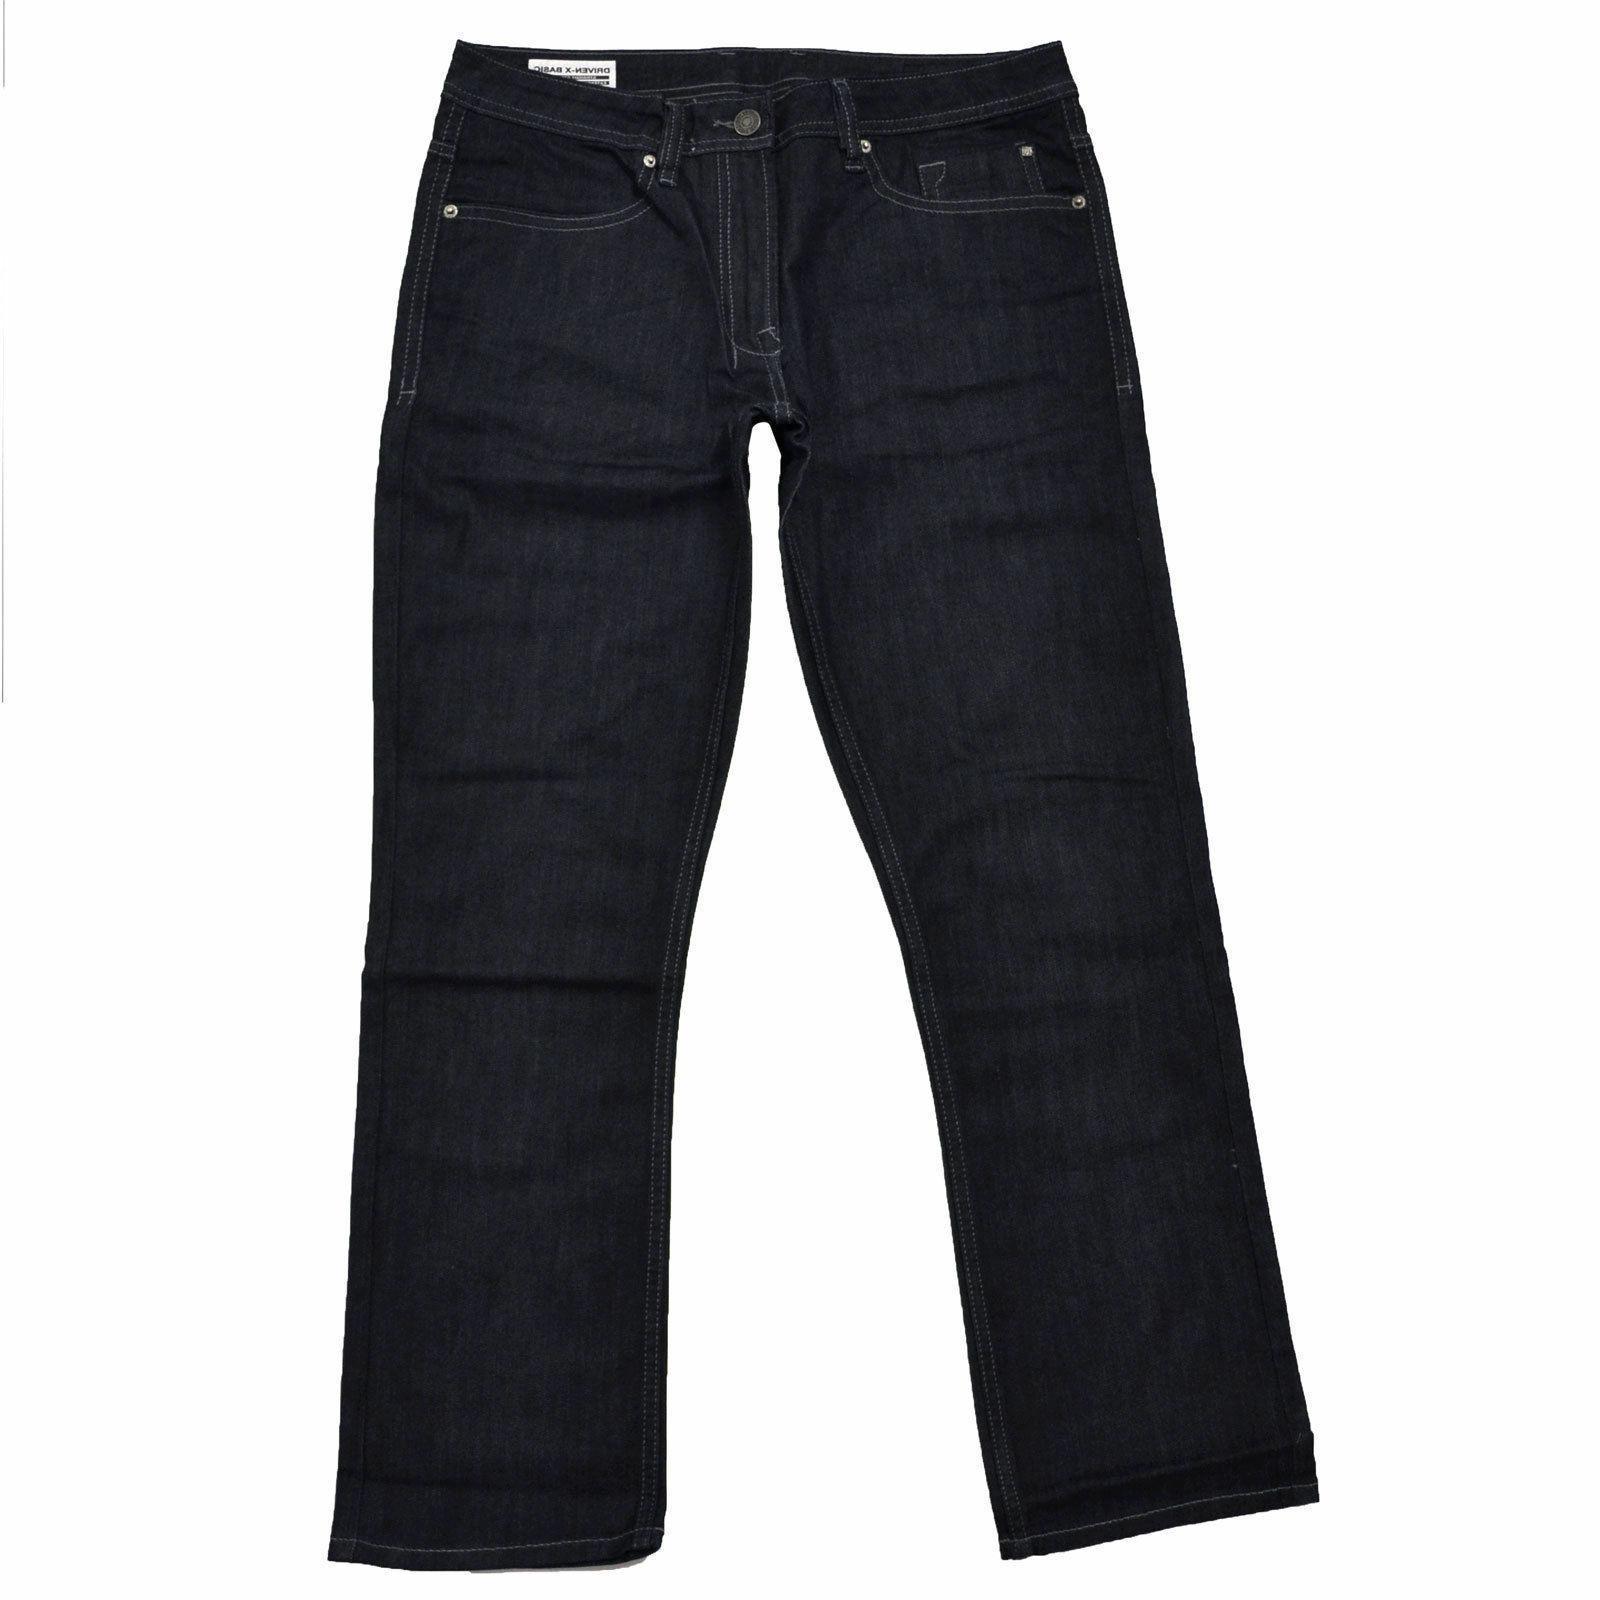 Buffalo Men's Stretch Driven-X Basic Jeans